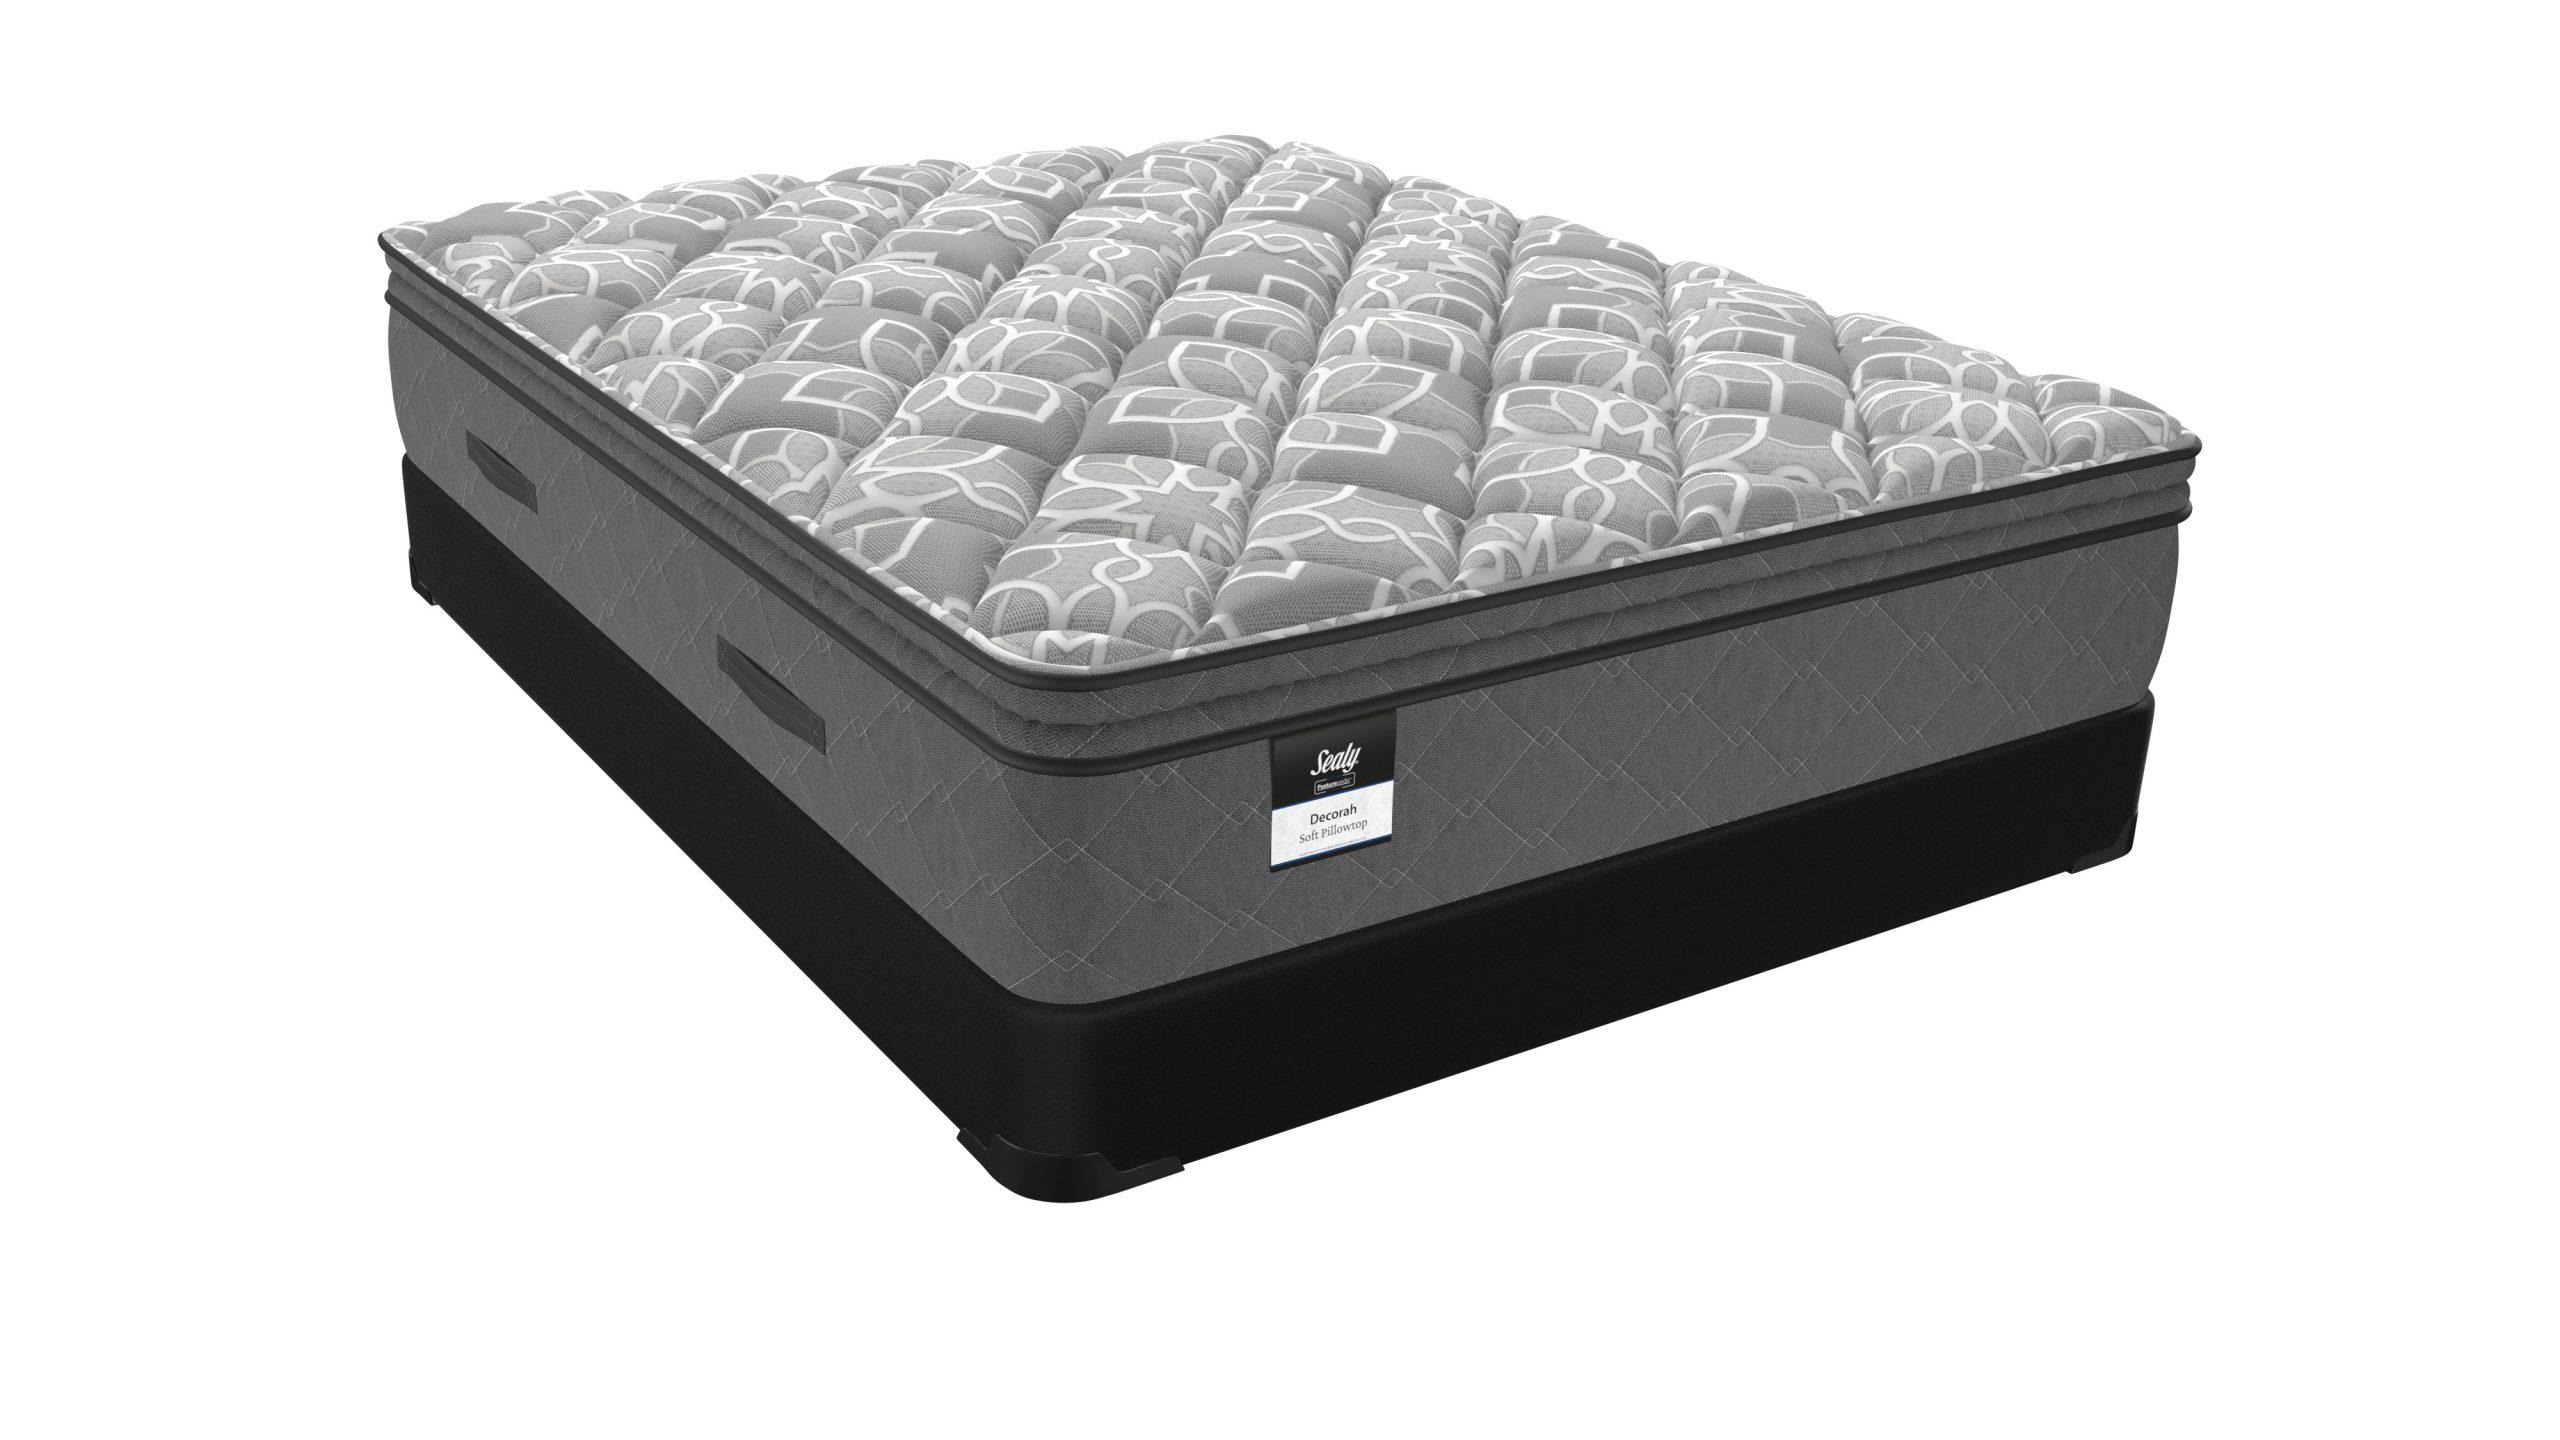 sealy posturepedic decorah deluxe soft euro pillow top